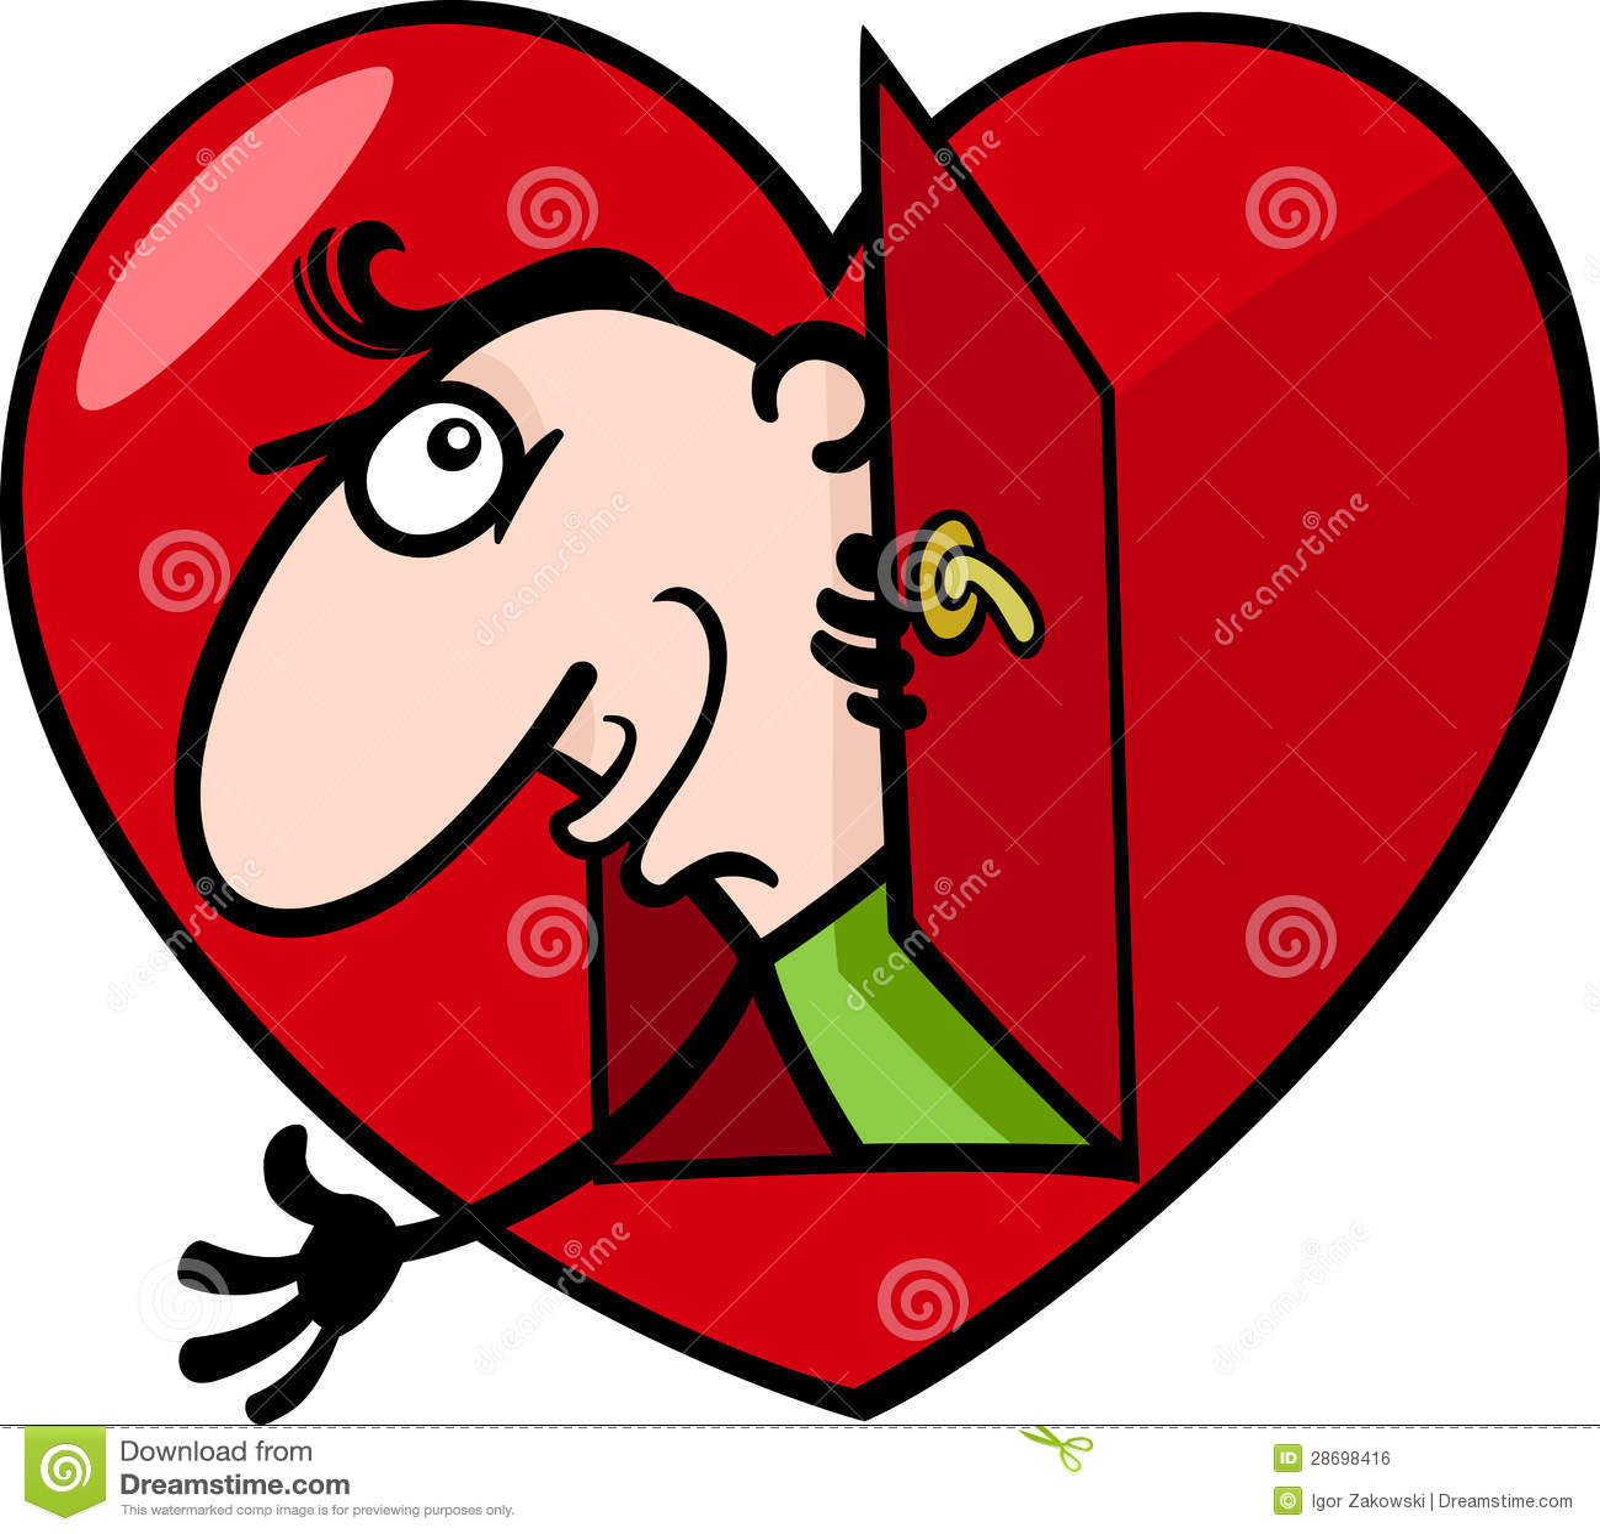 Man In Big Valentine Heart Cartoon Illustration Royalty